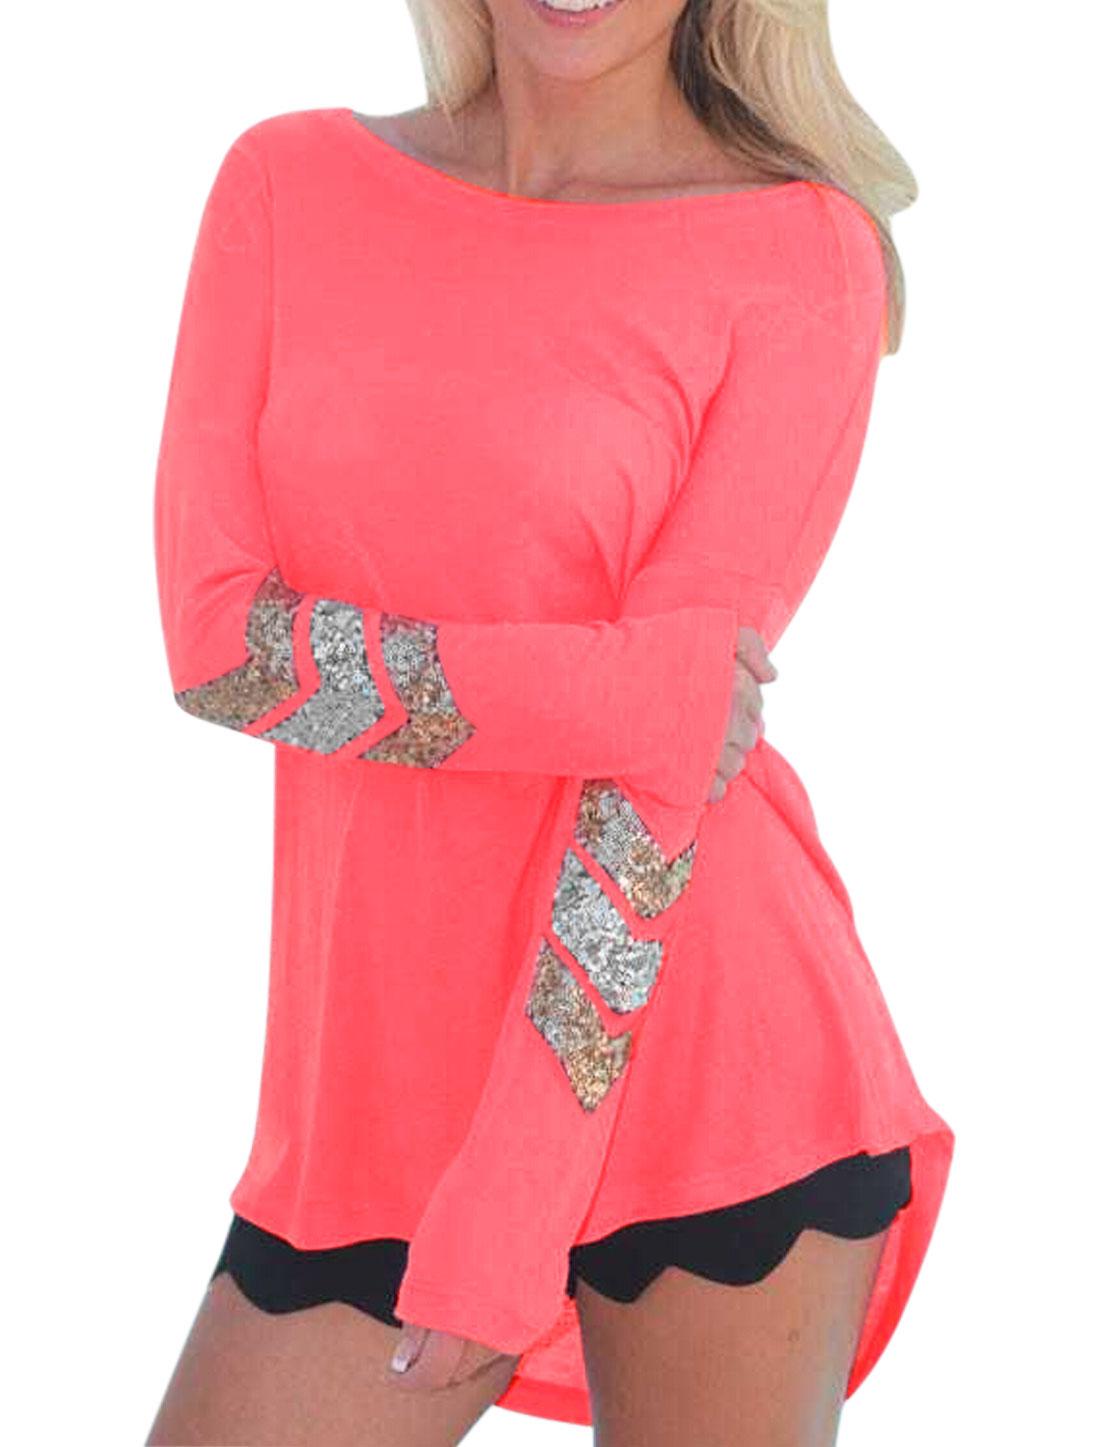 Women Long Batwing Sleeves Sequin Embellished High Low Hem T-Shirt Pink XS